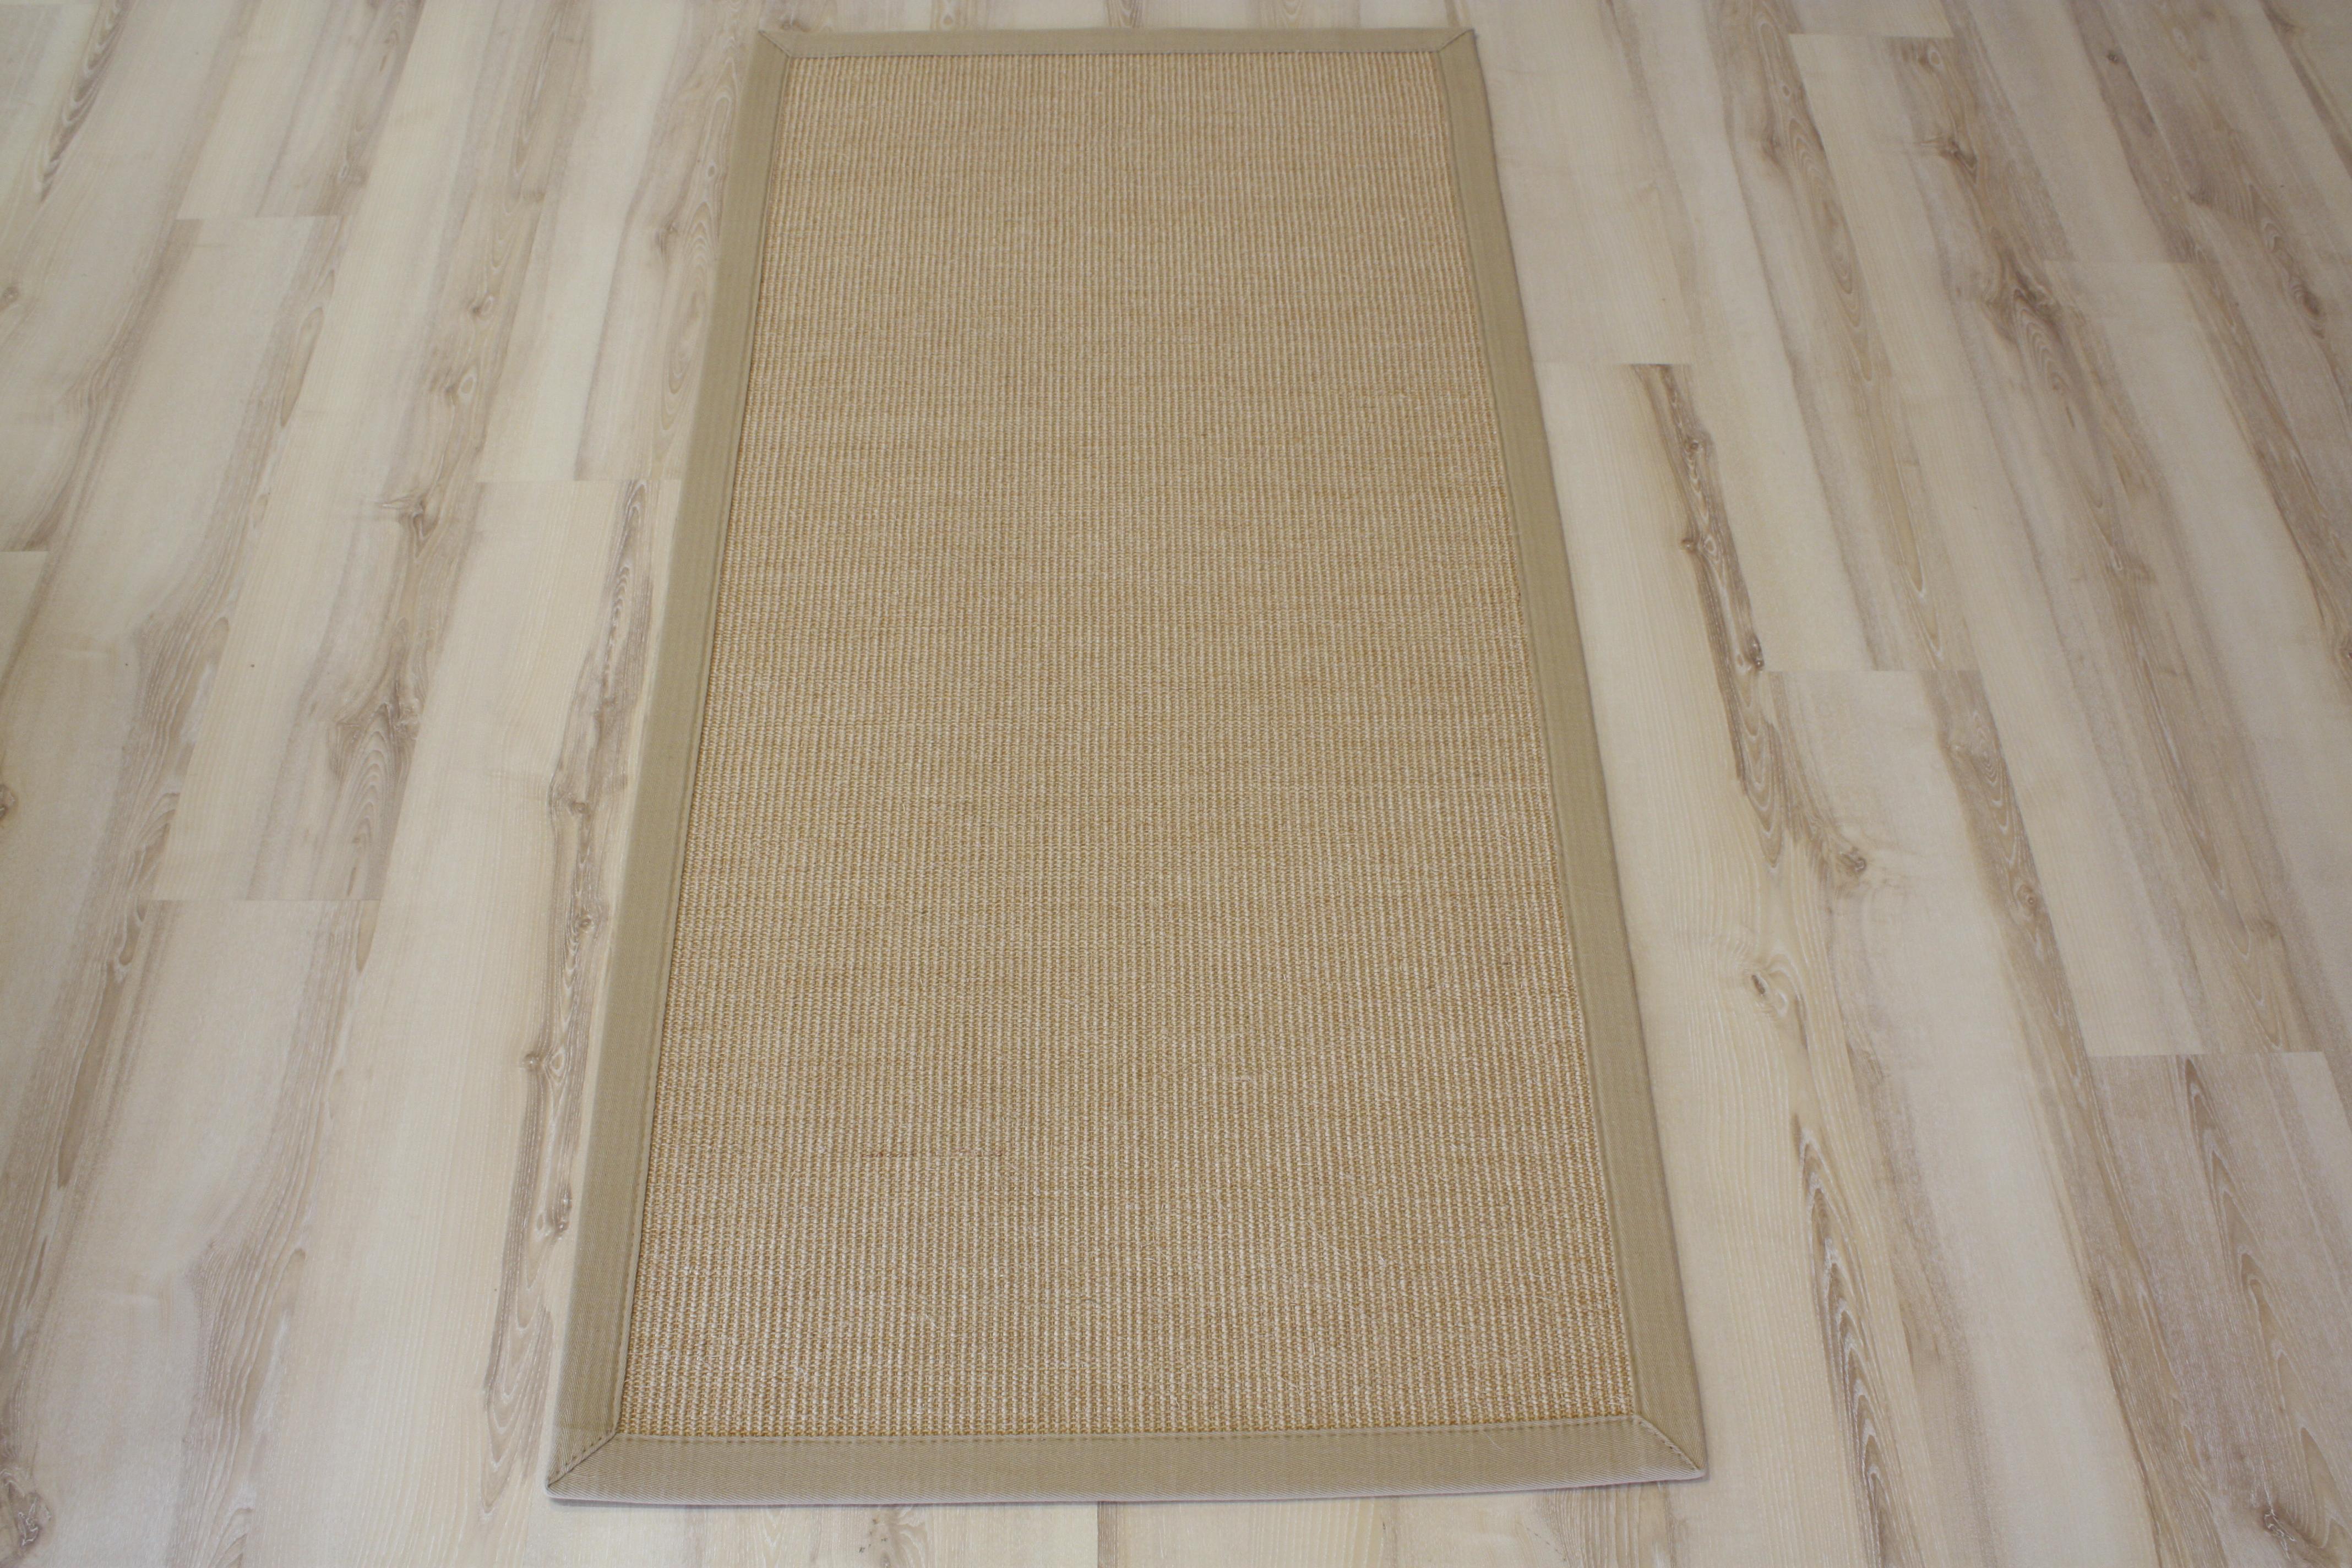 Sisal alfombra con bordura natural 250x350cm 100 sisal ebay - Alfombras de sisal ...